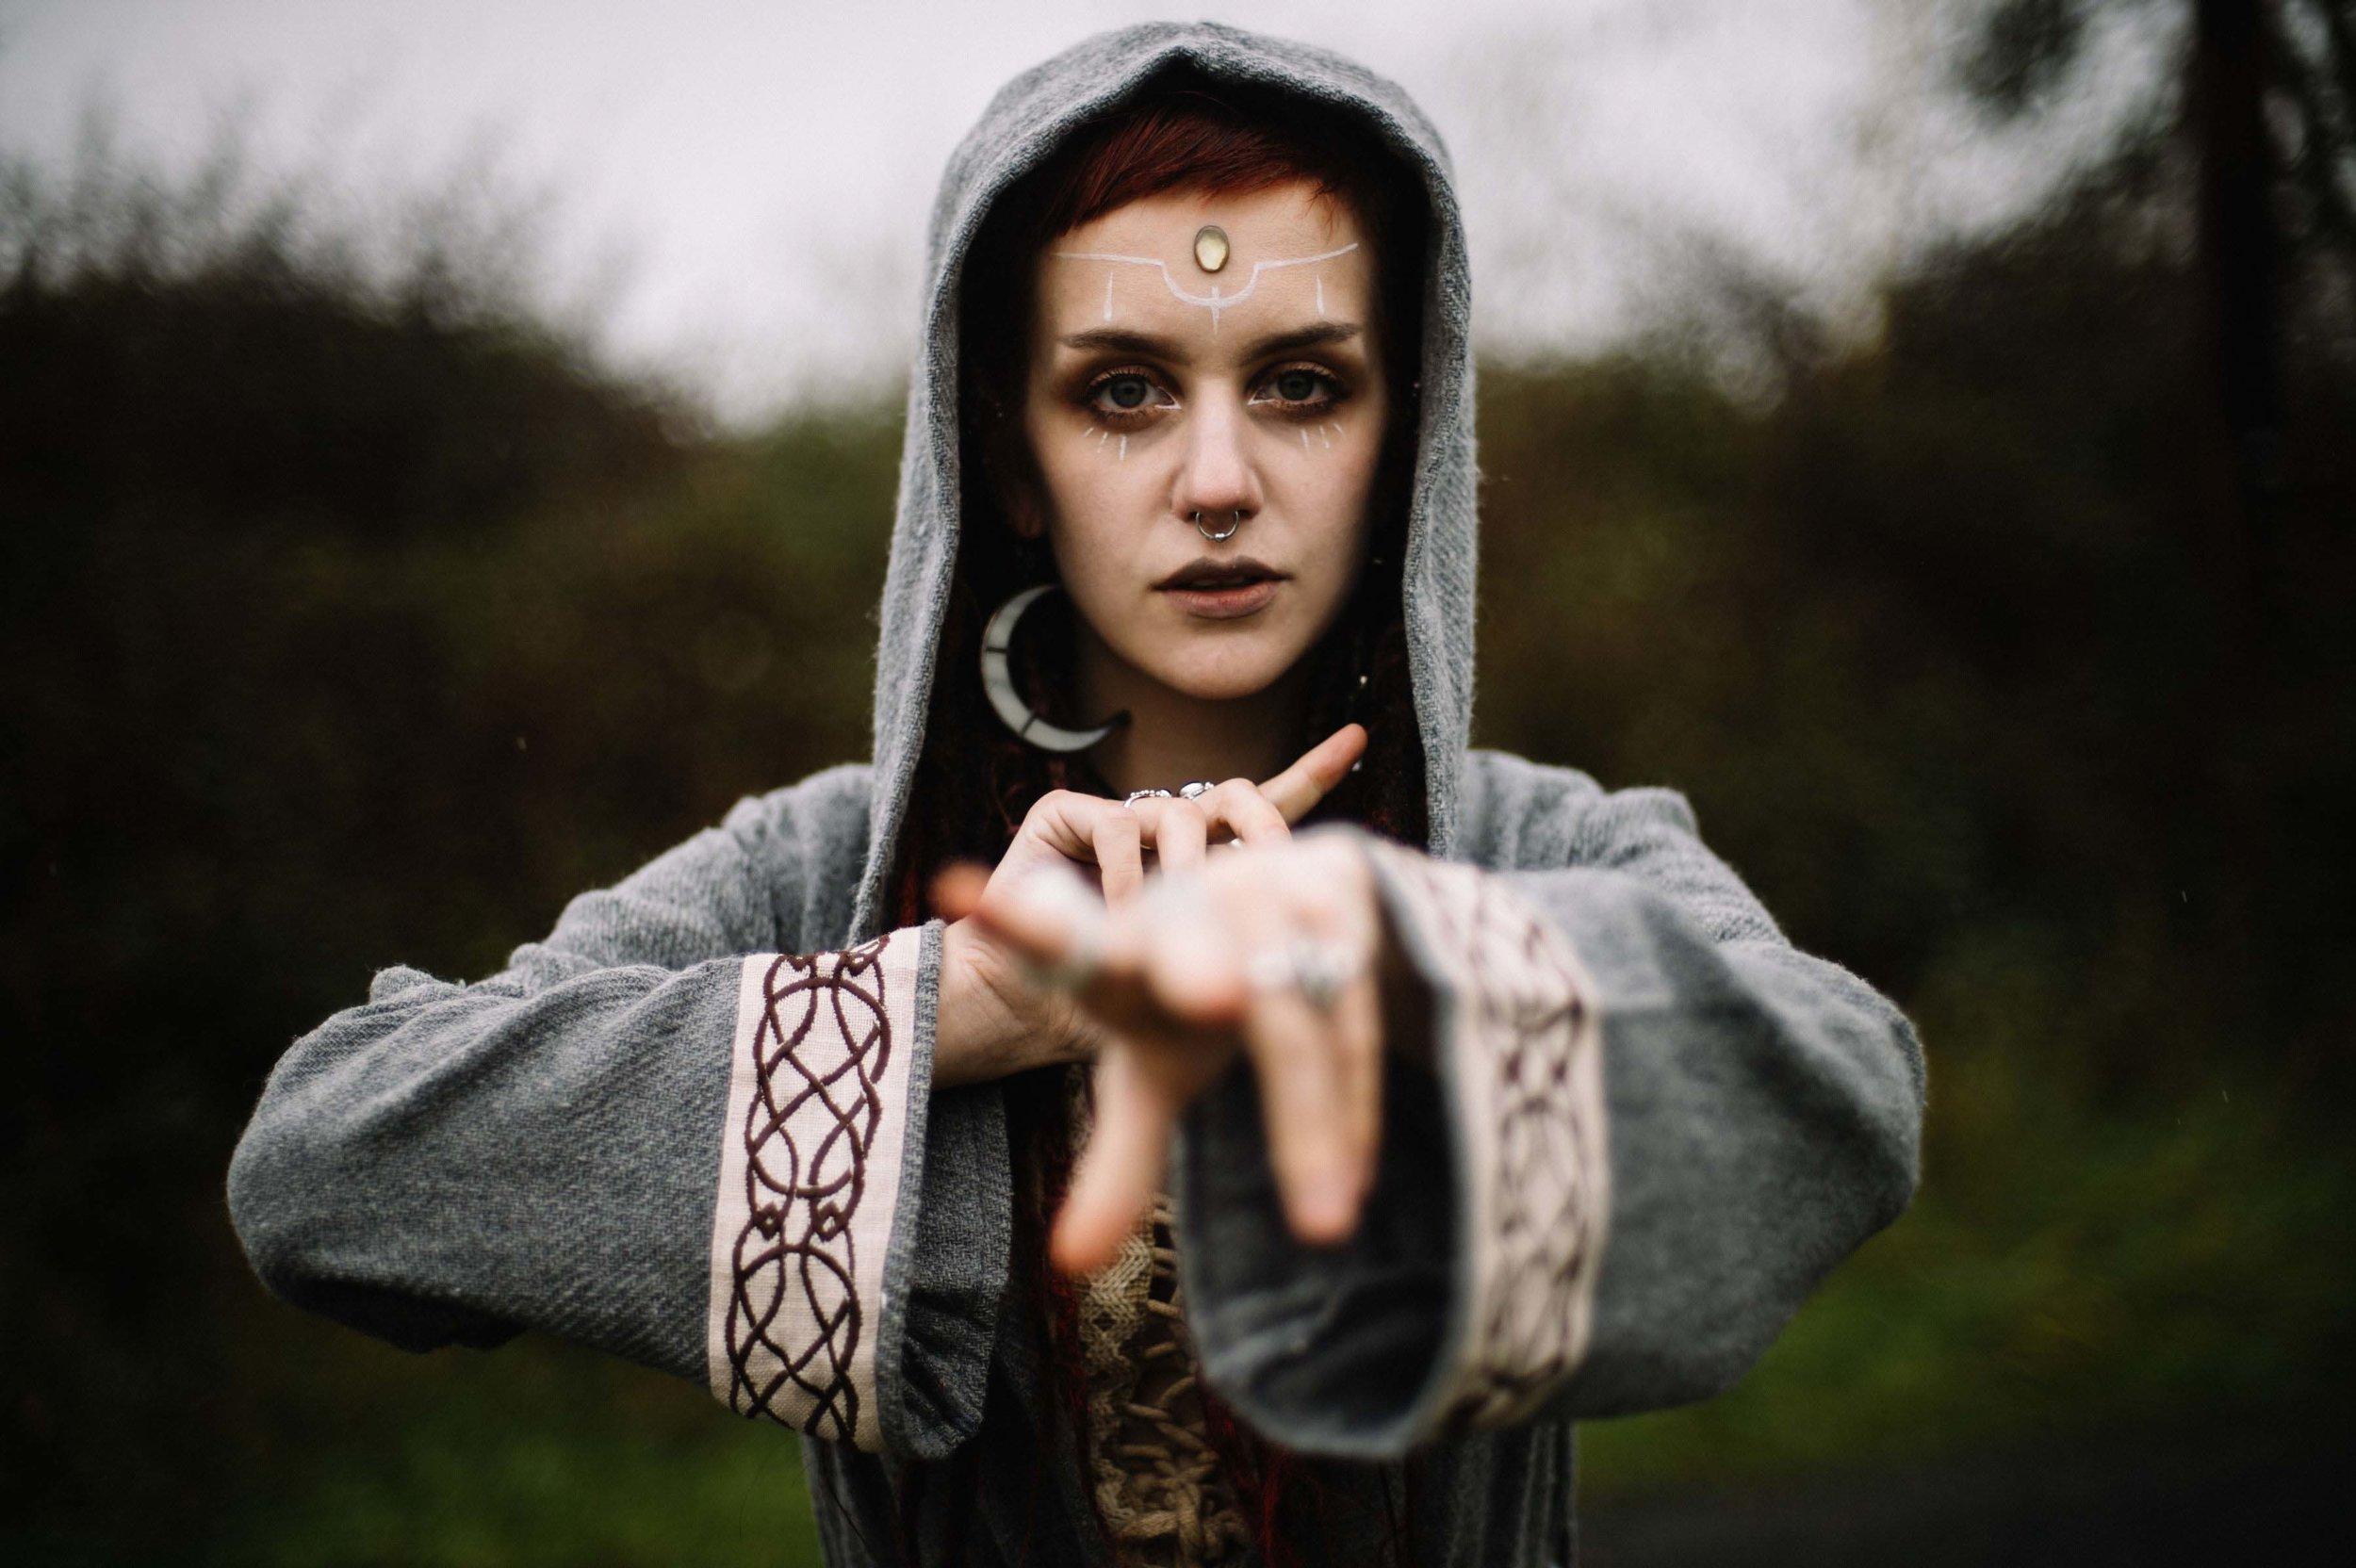 Creating Magic, manifesting Dreams….. fantastic photography by Kate bean photography.